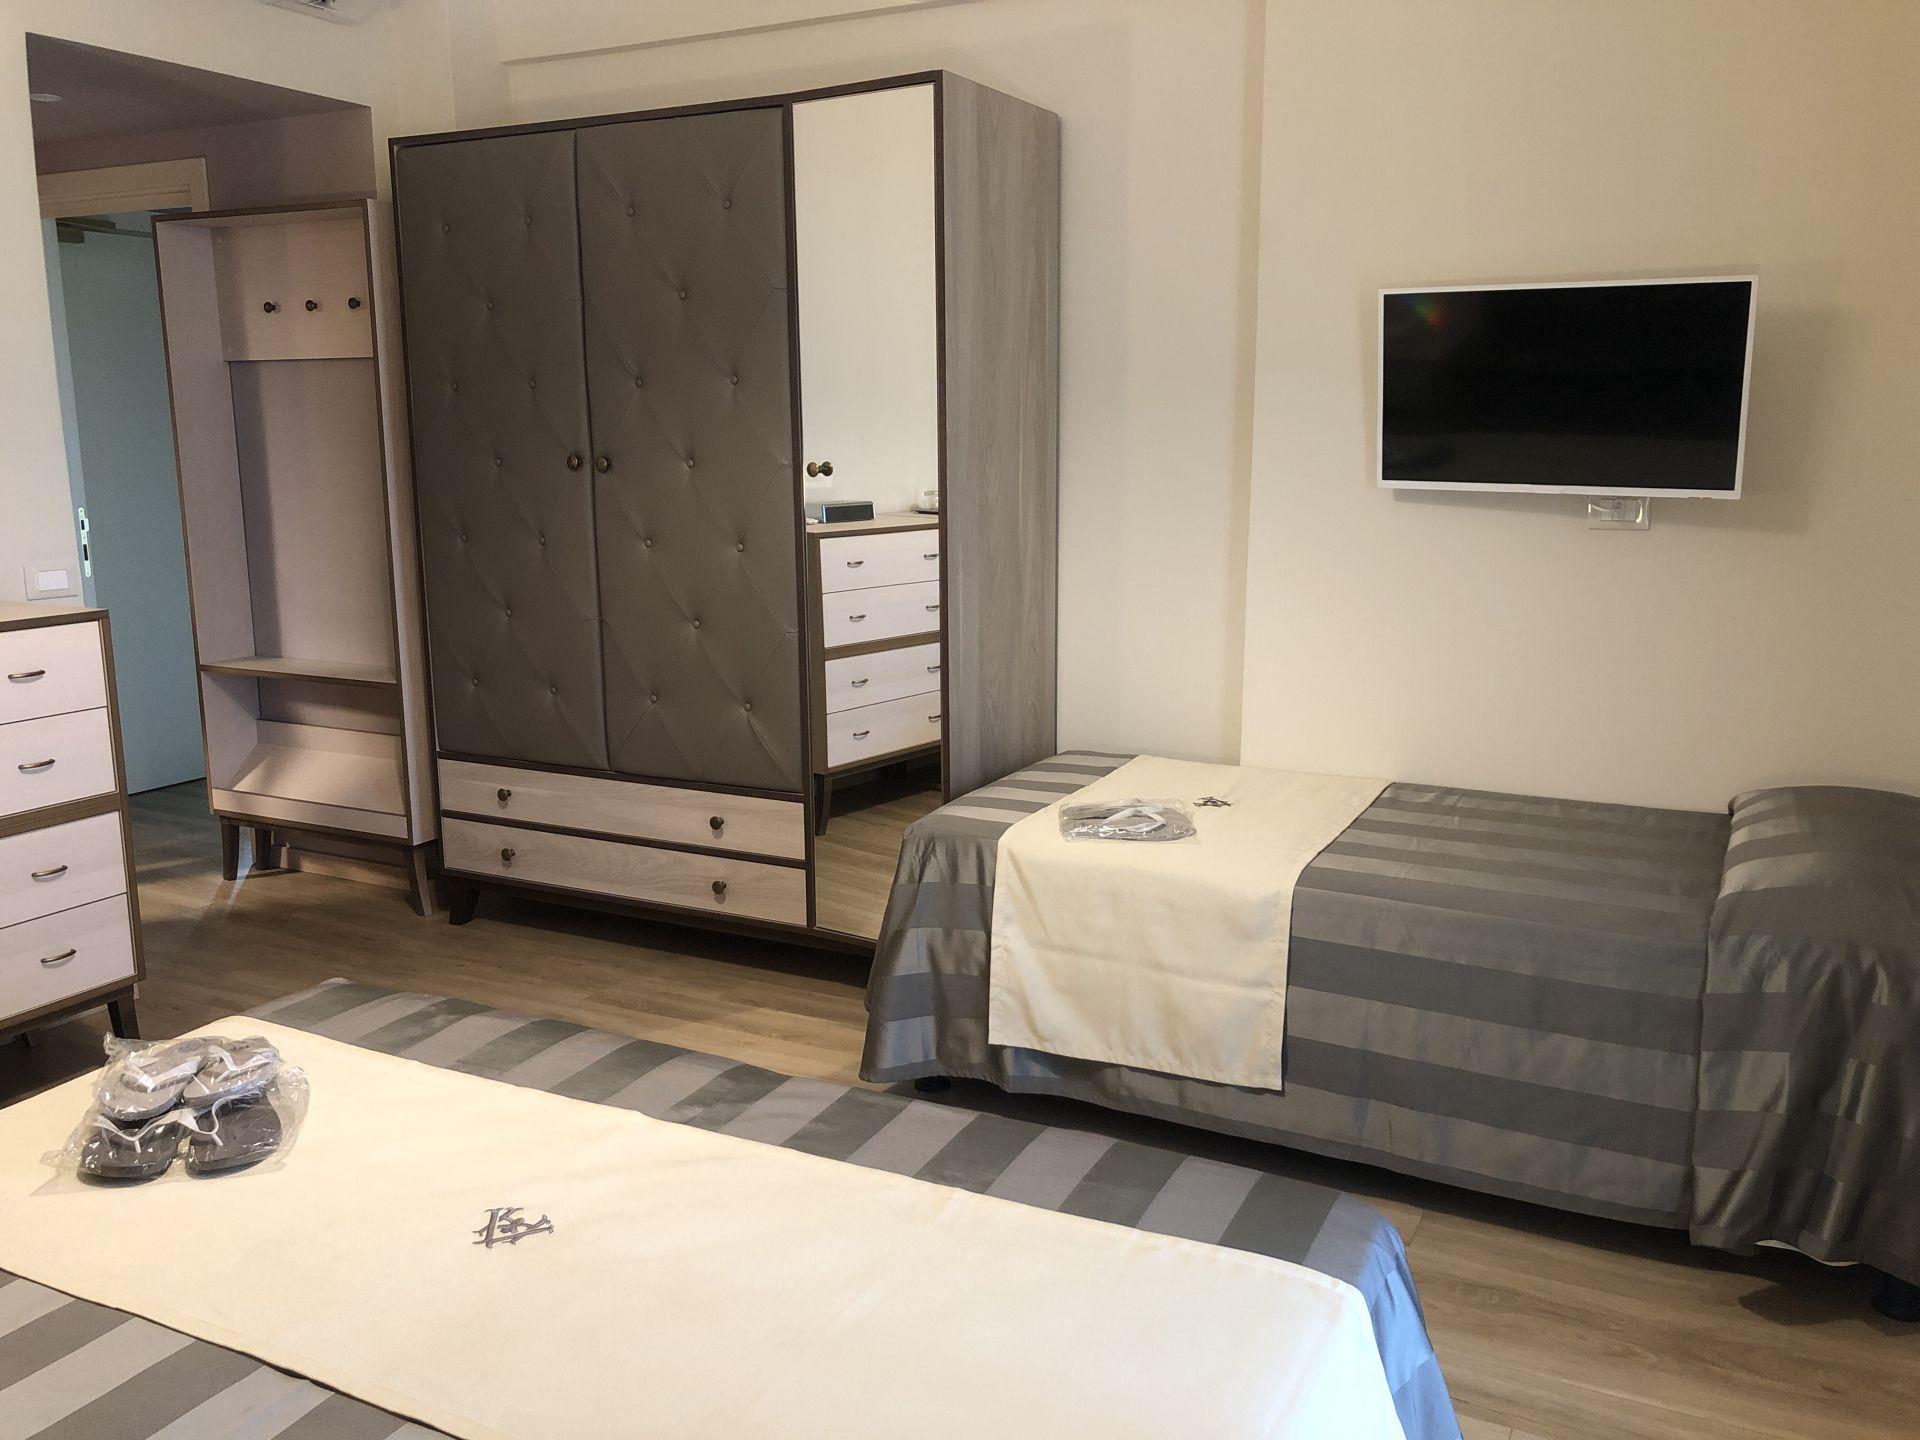 Hotel Atlantico 2020 camera tripla A